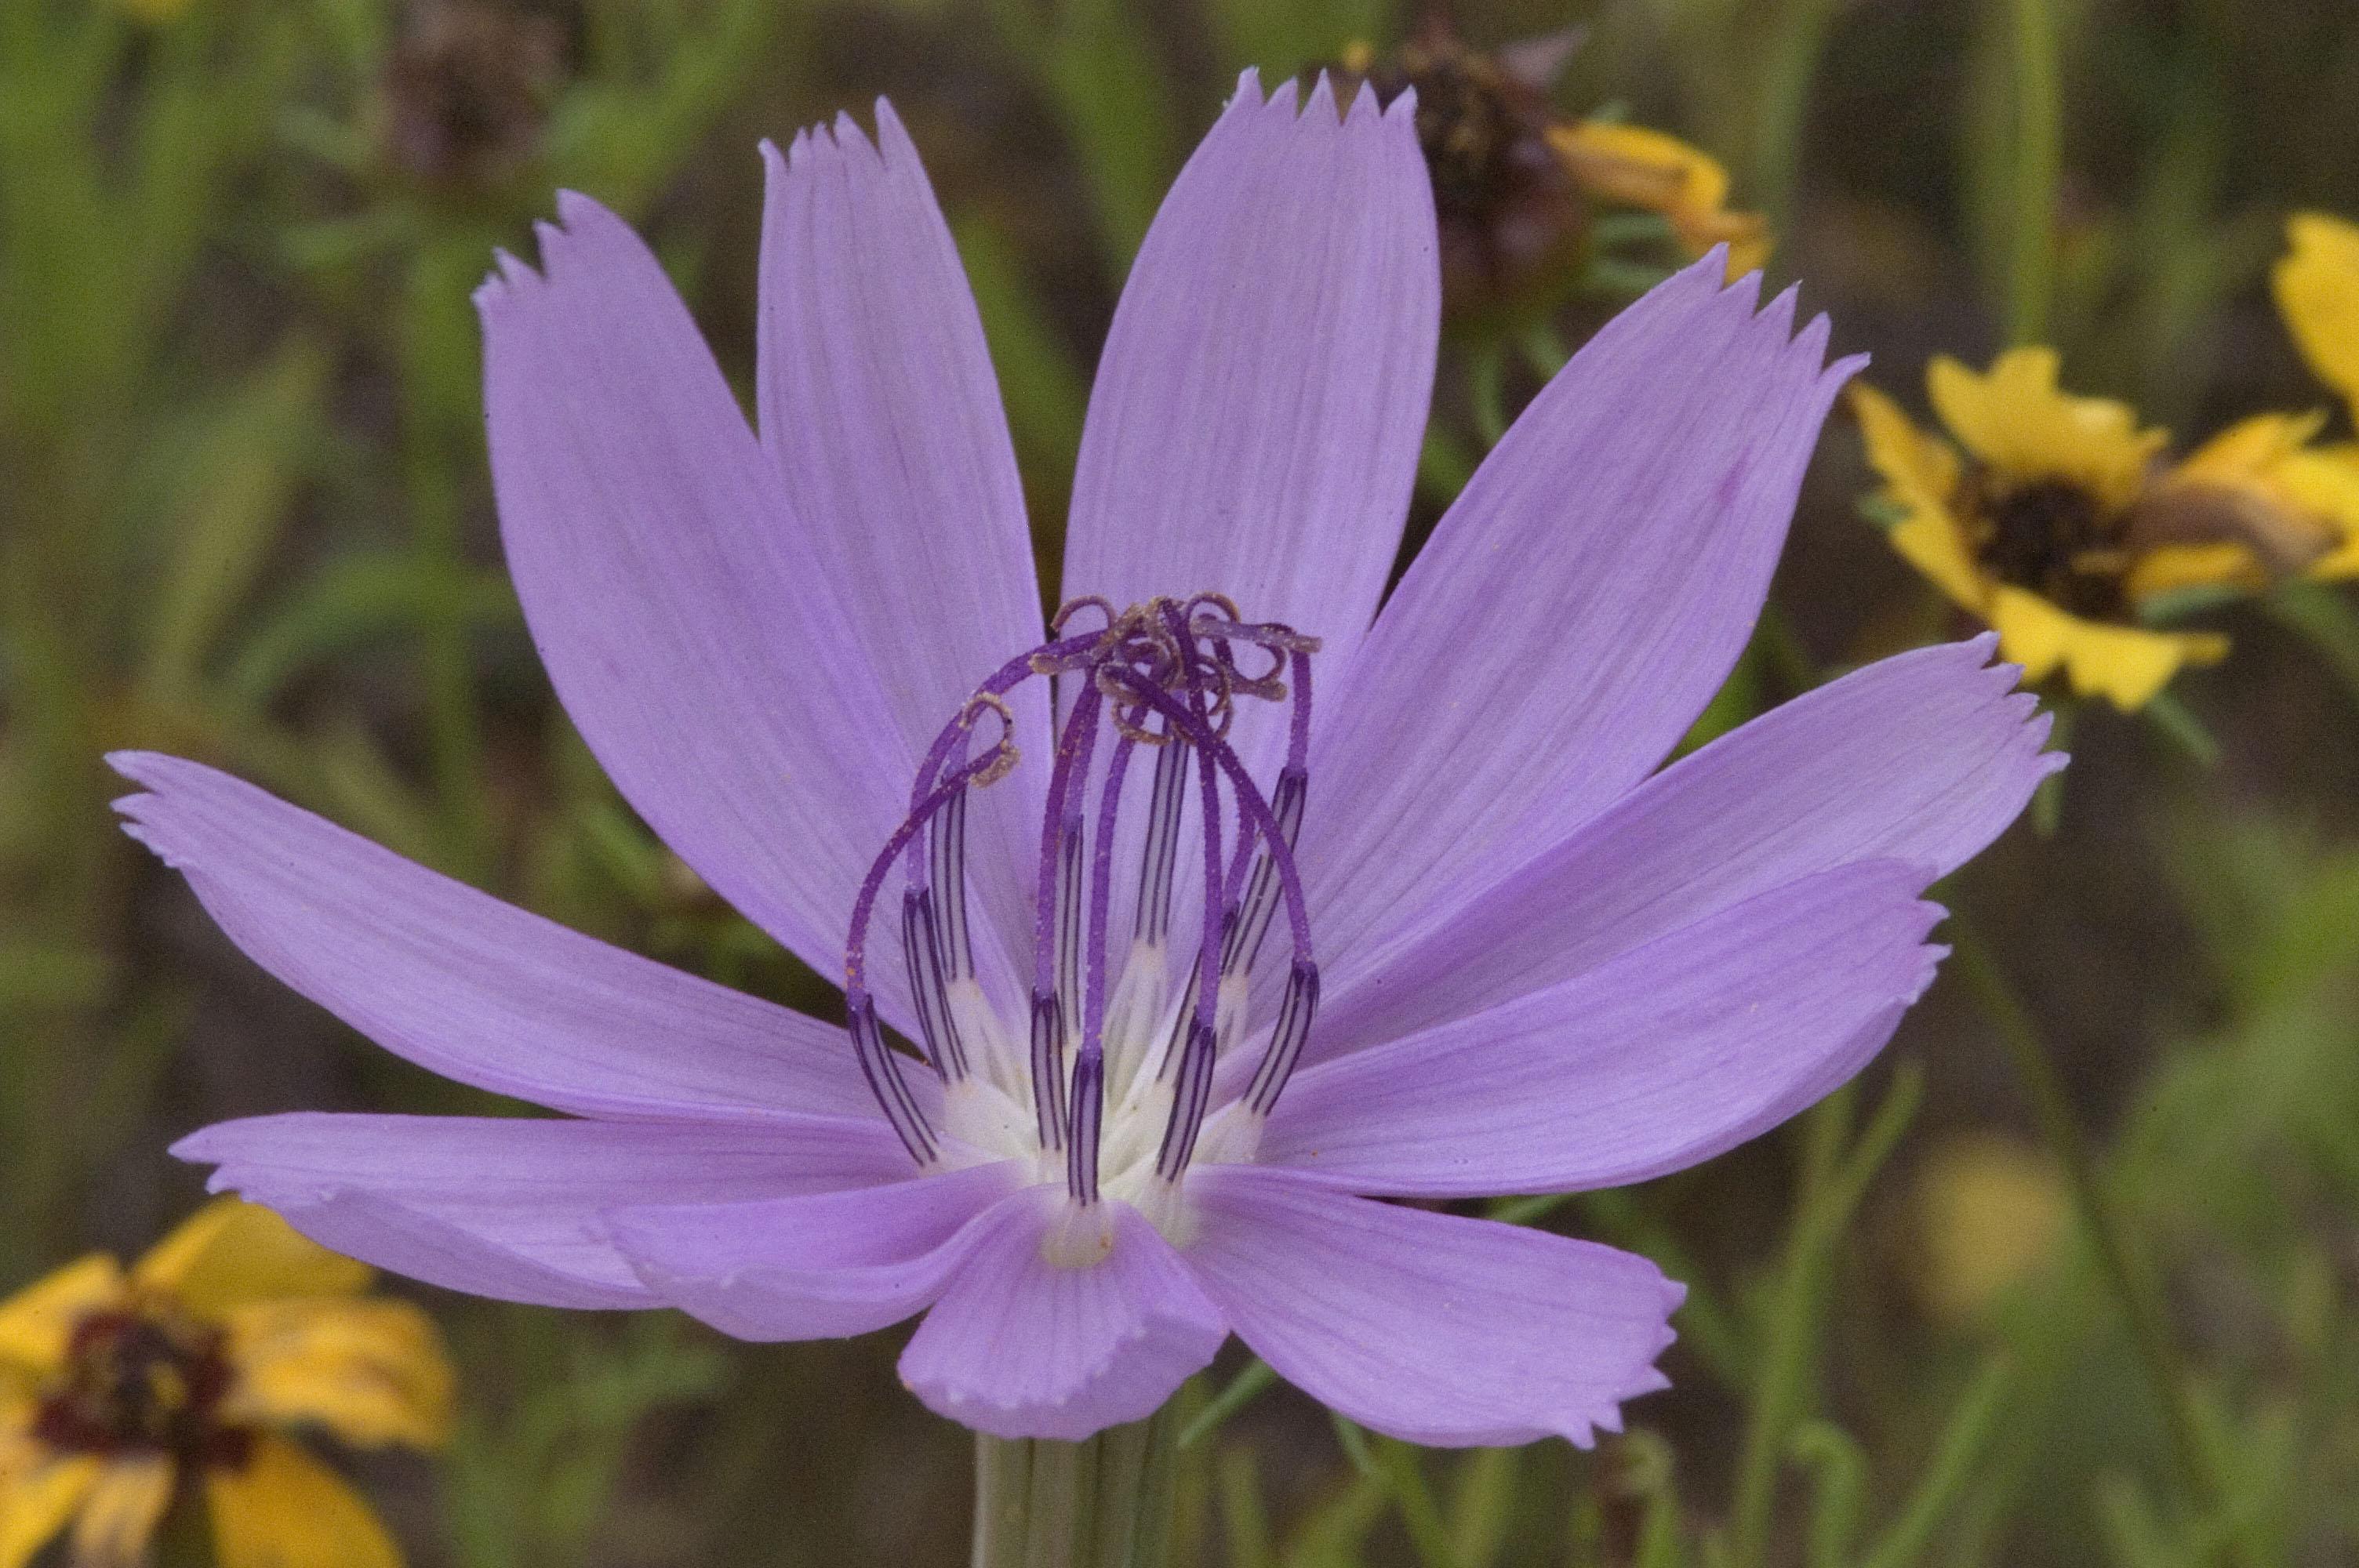 642 06 Skeleton plant Lygodesmia texana flower with Old Baylor Par